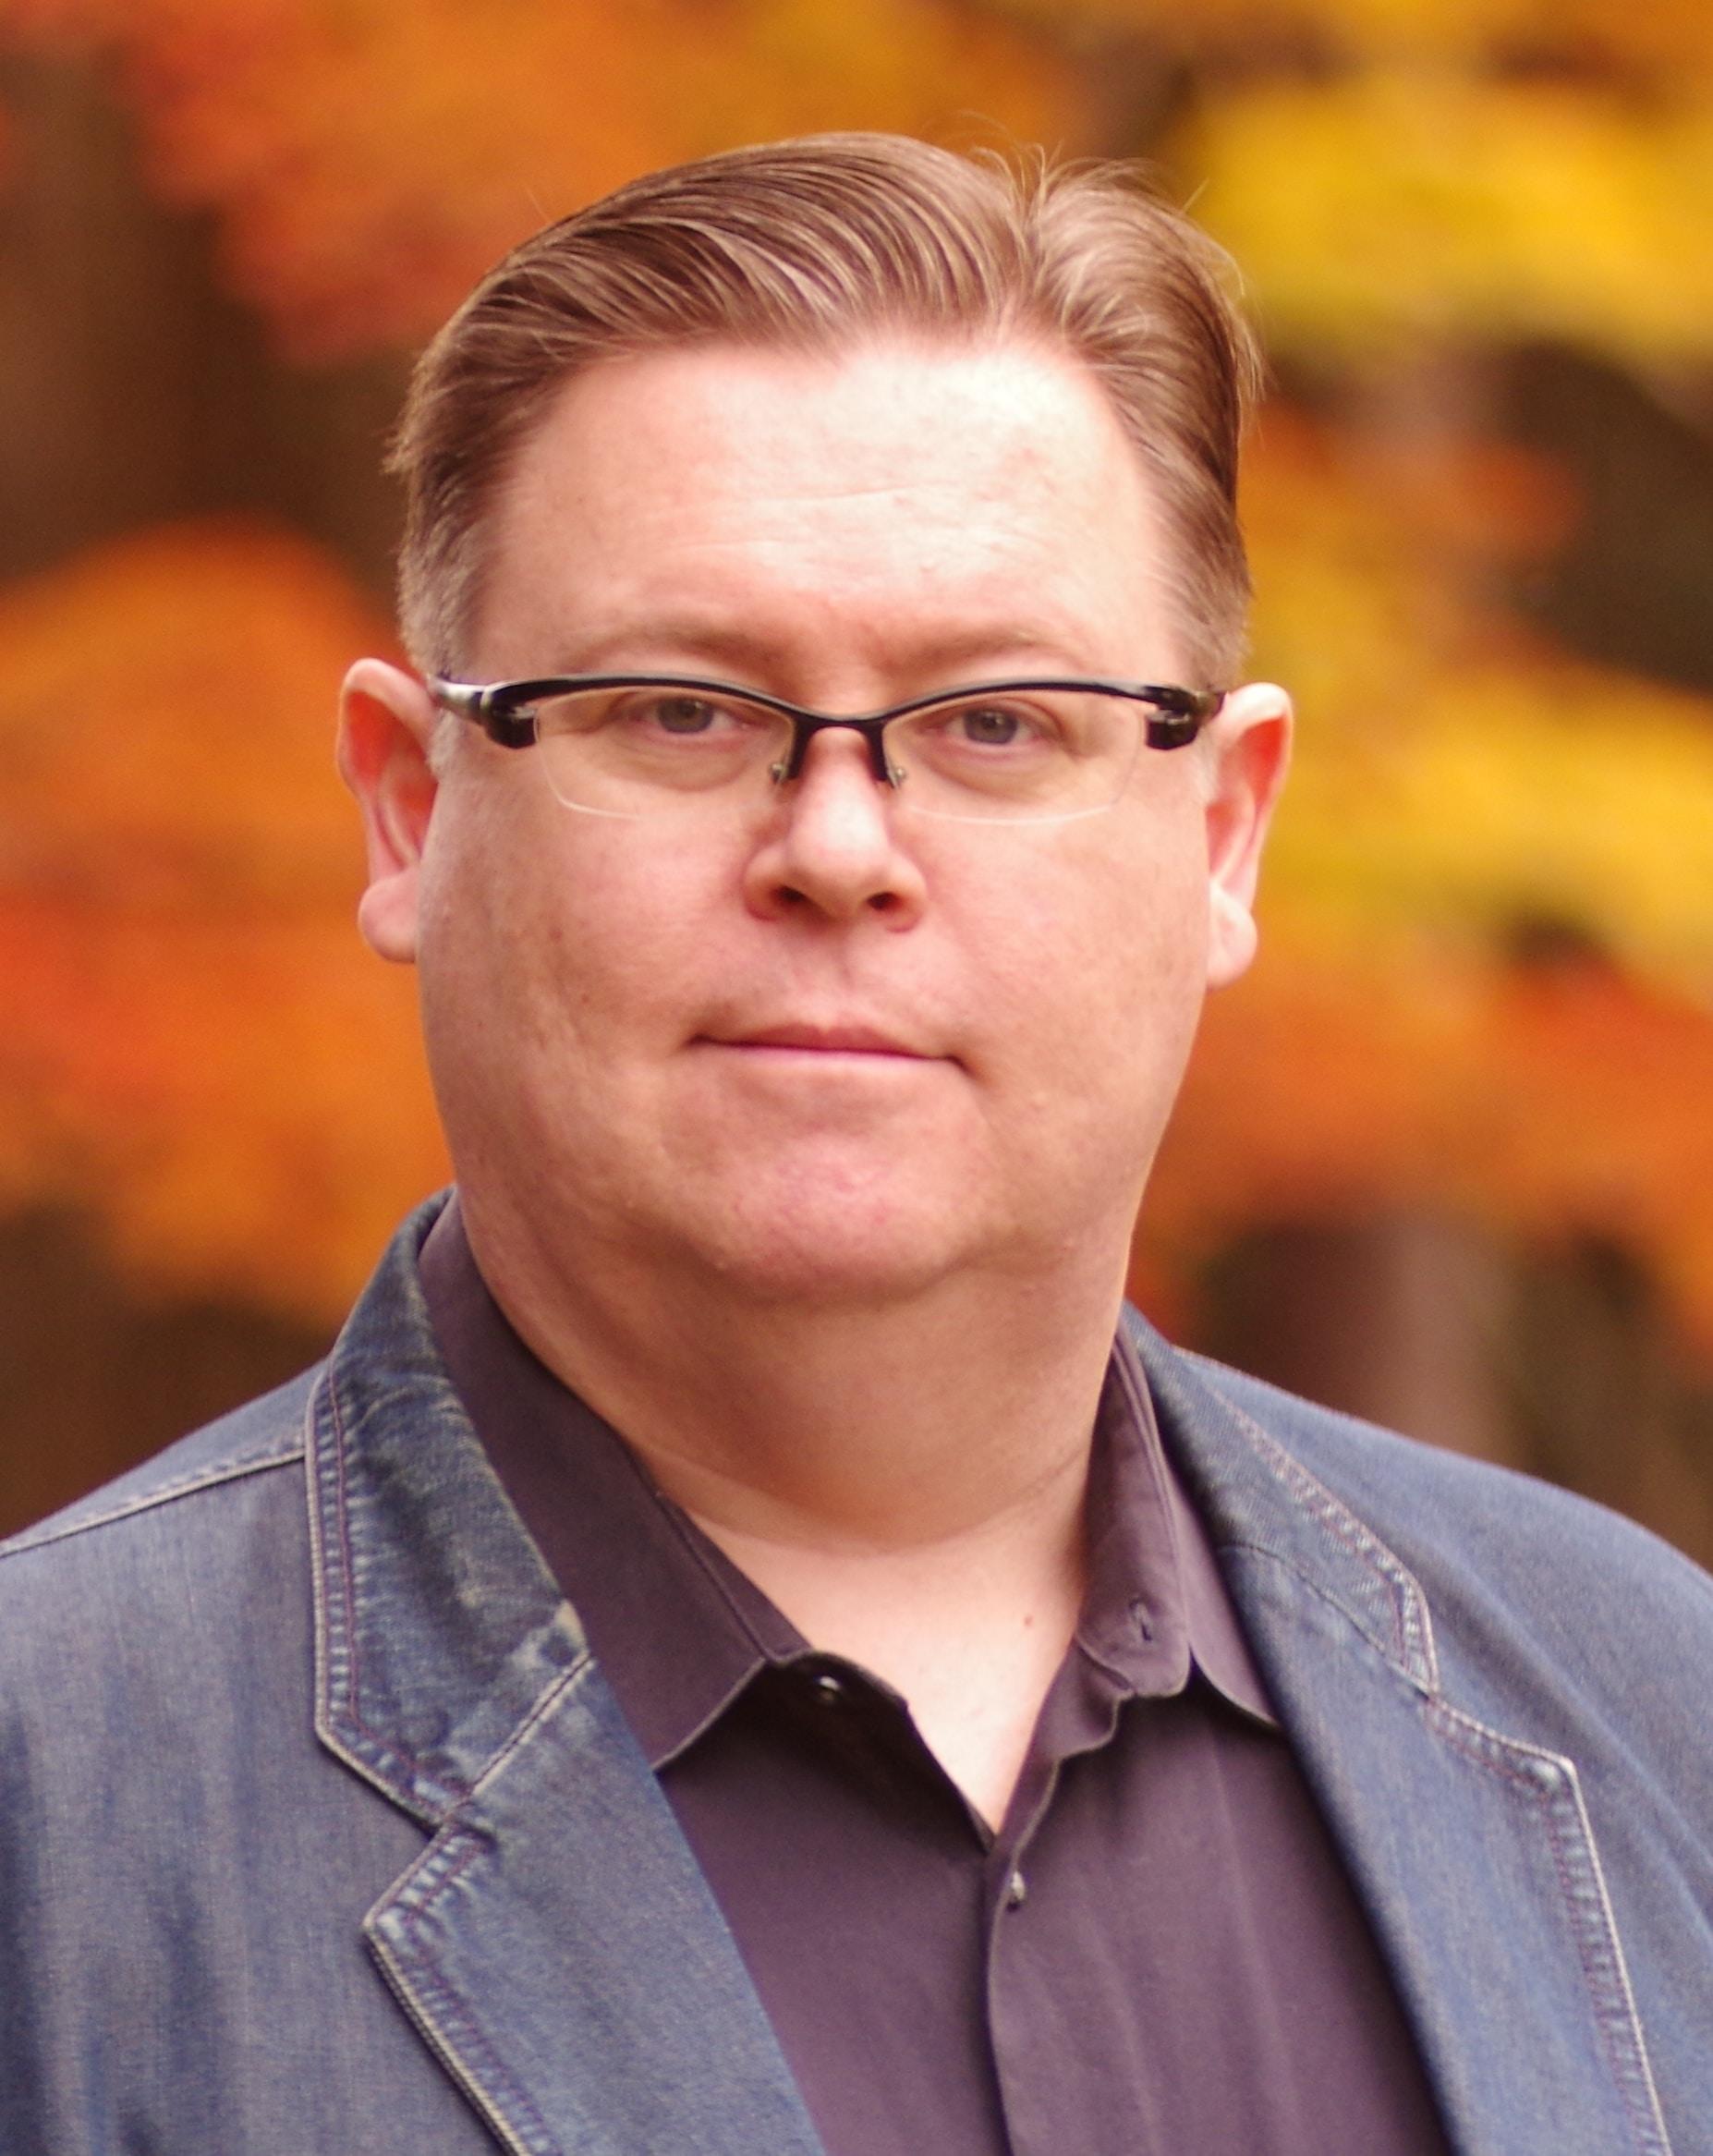 Avatar of user Joel Neff